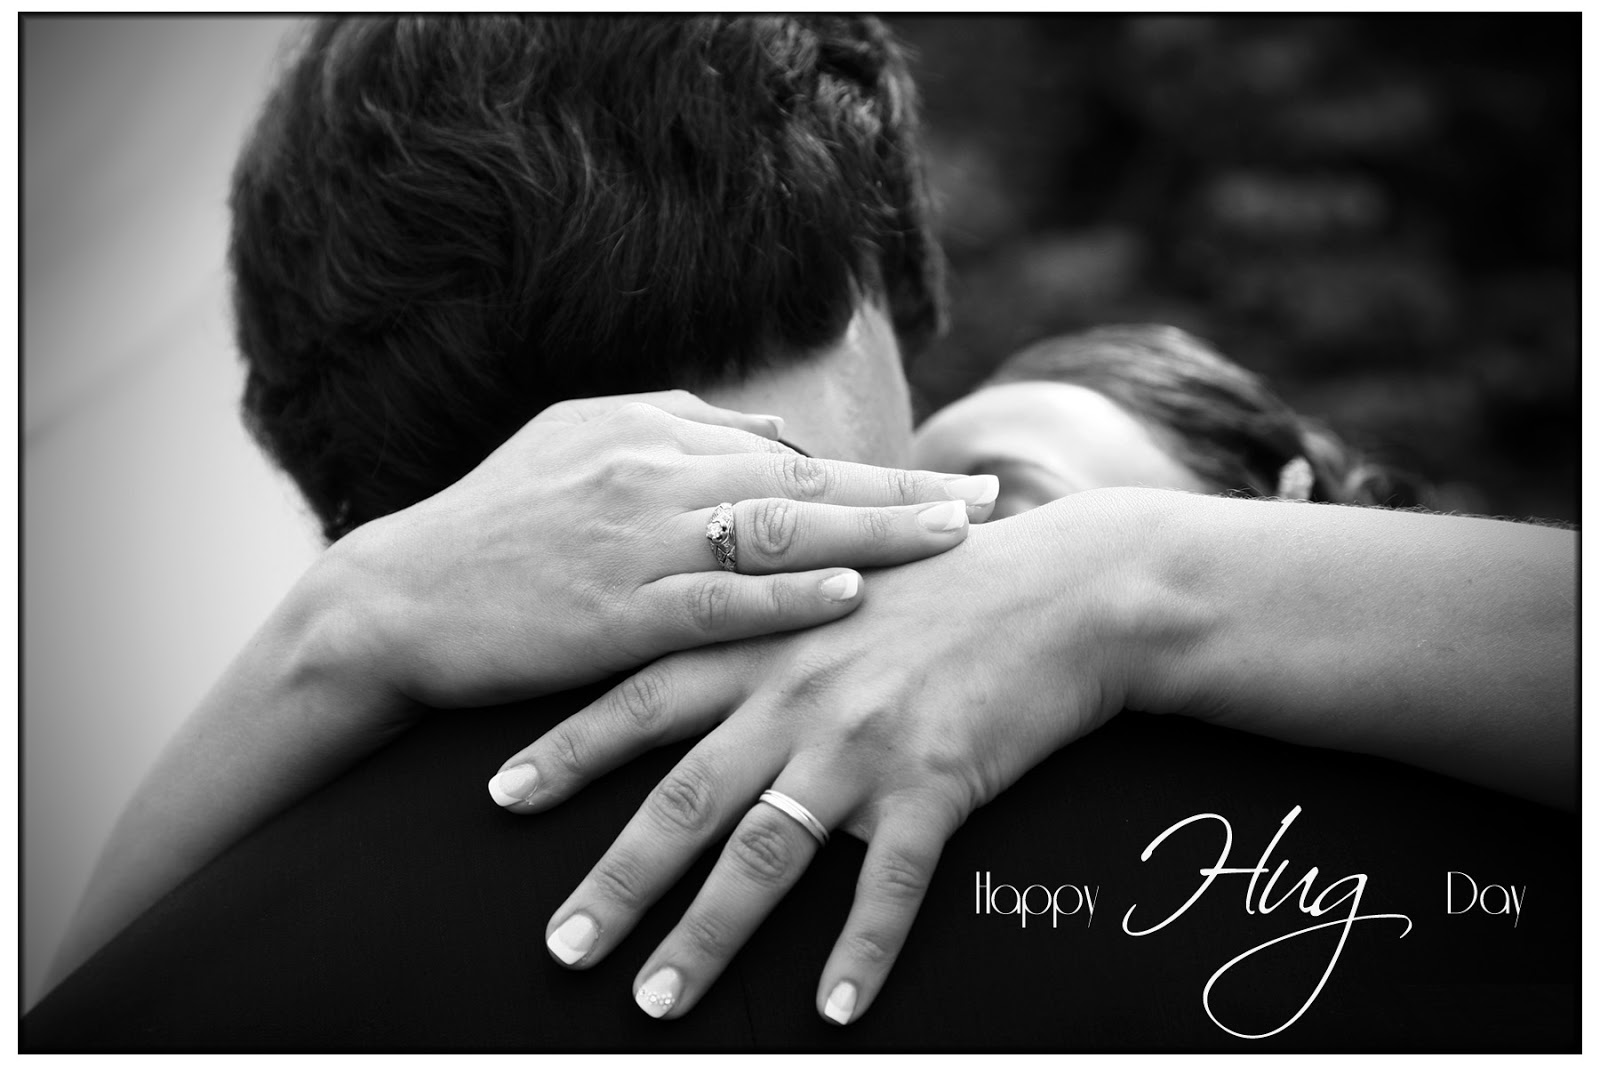 happy valentine hug day hd image for boyfriend